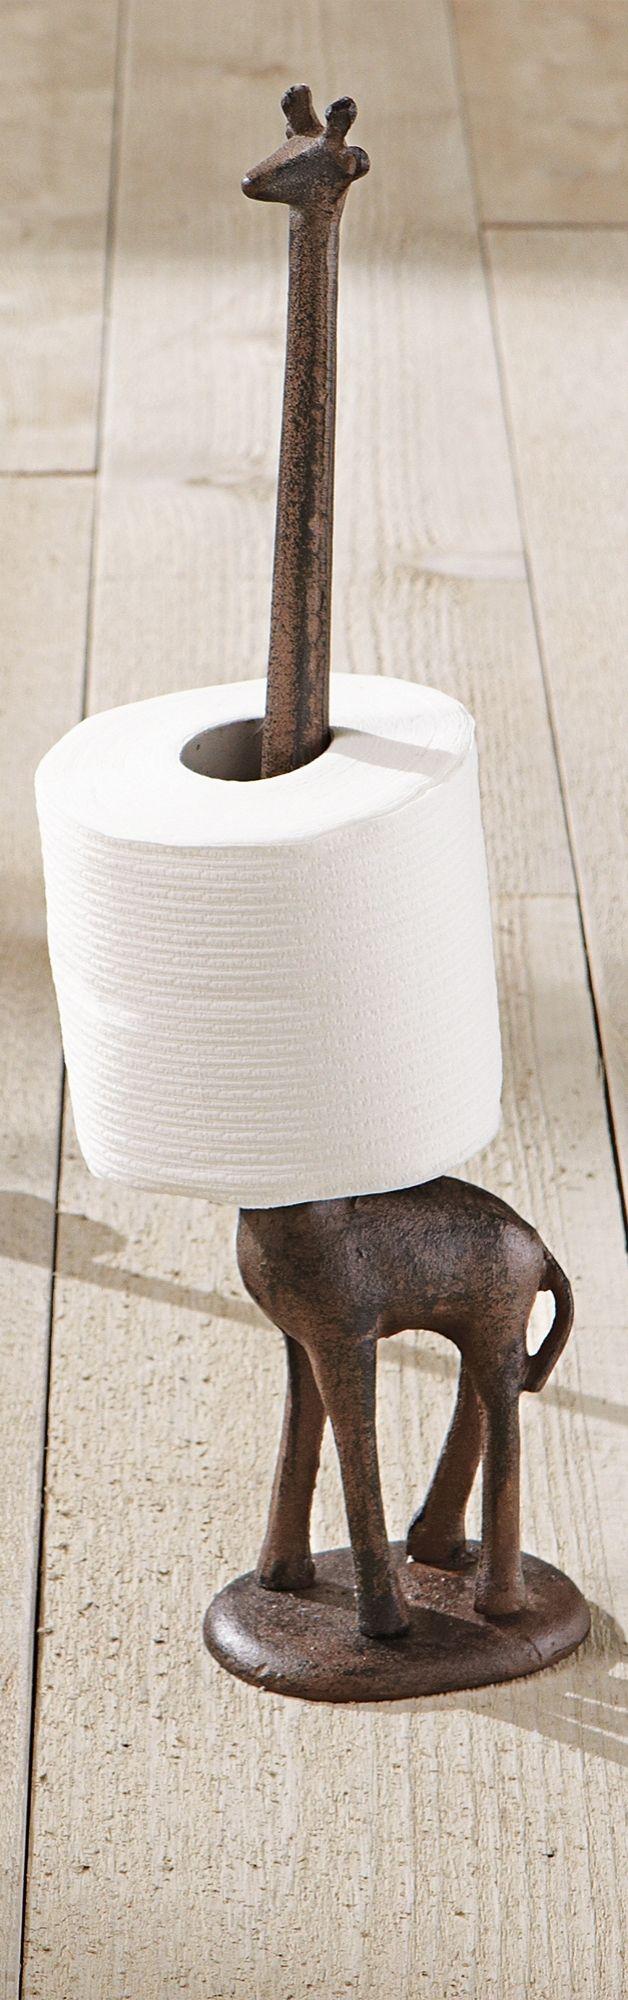 Giraffe Bathroom Decor 302 Best Ideas About Bath Essentials On Pinterest Cotton Towels